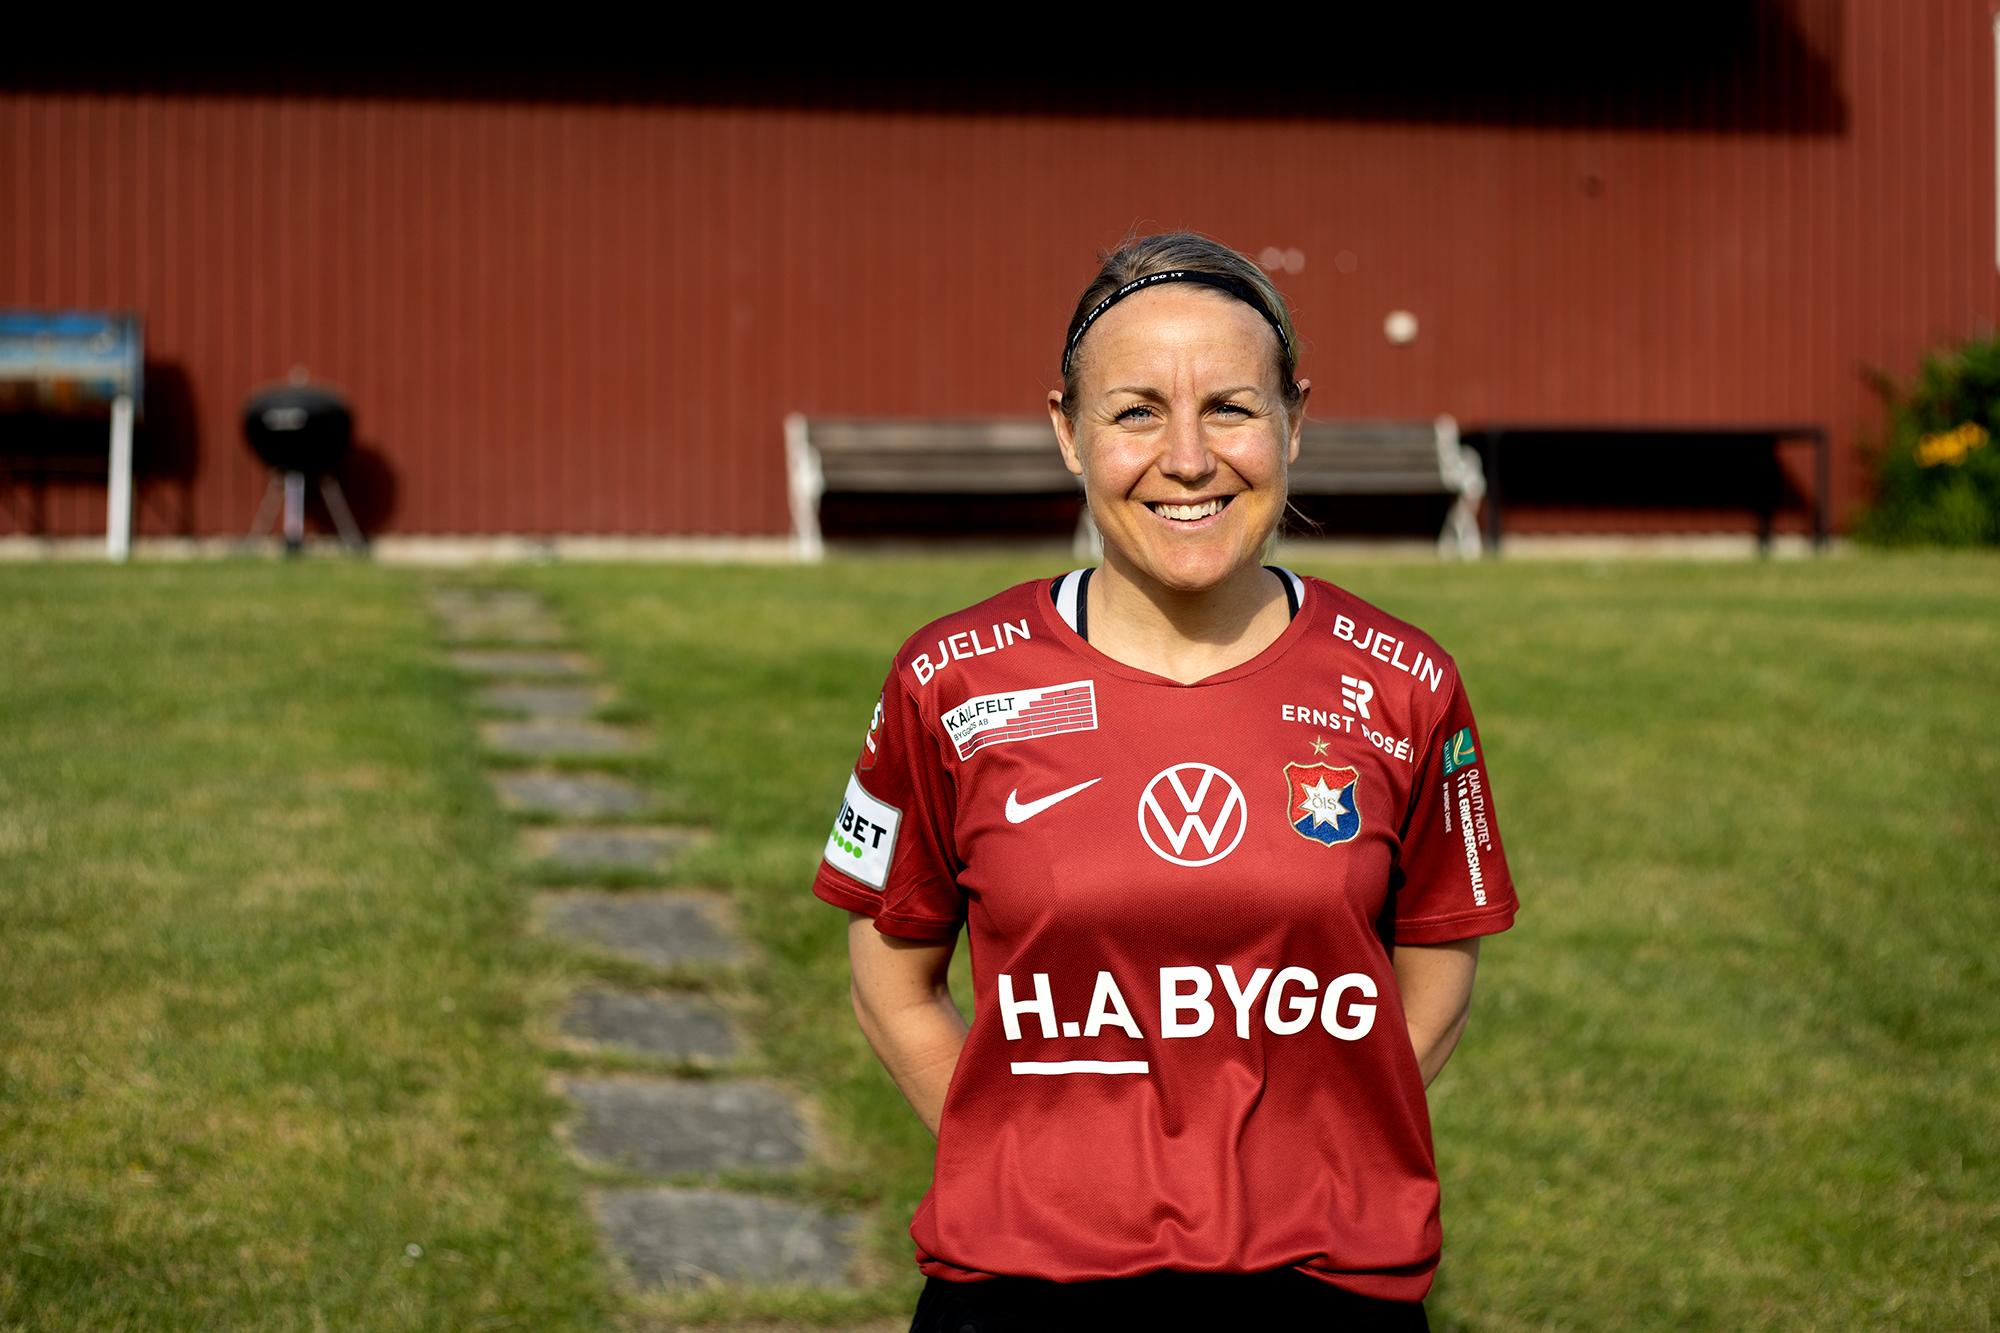 Sofia Palmquist